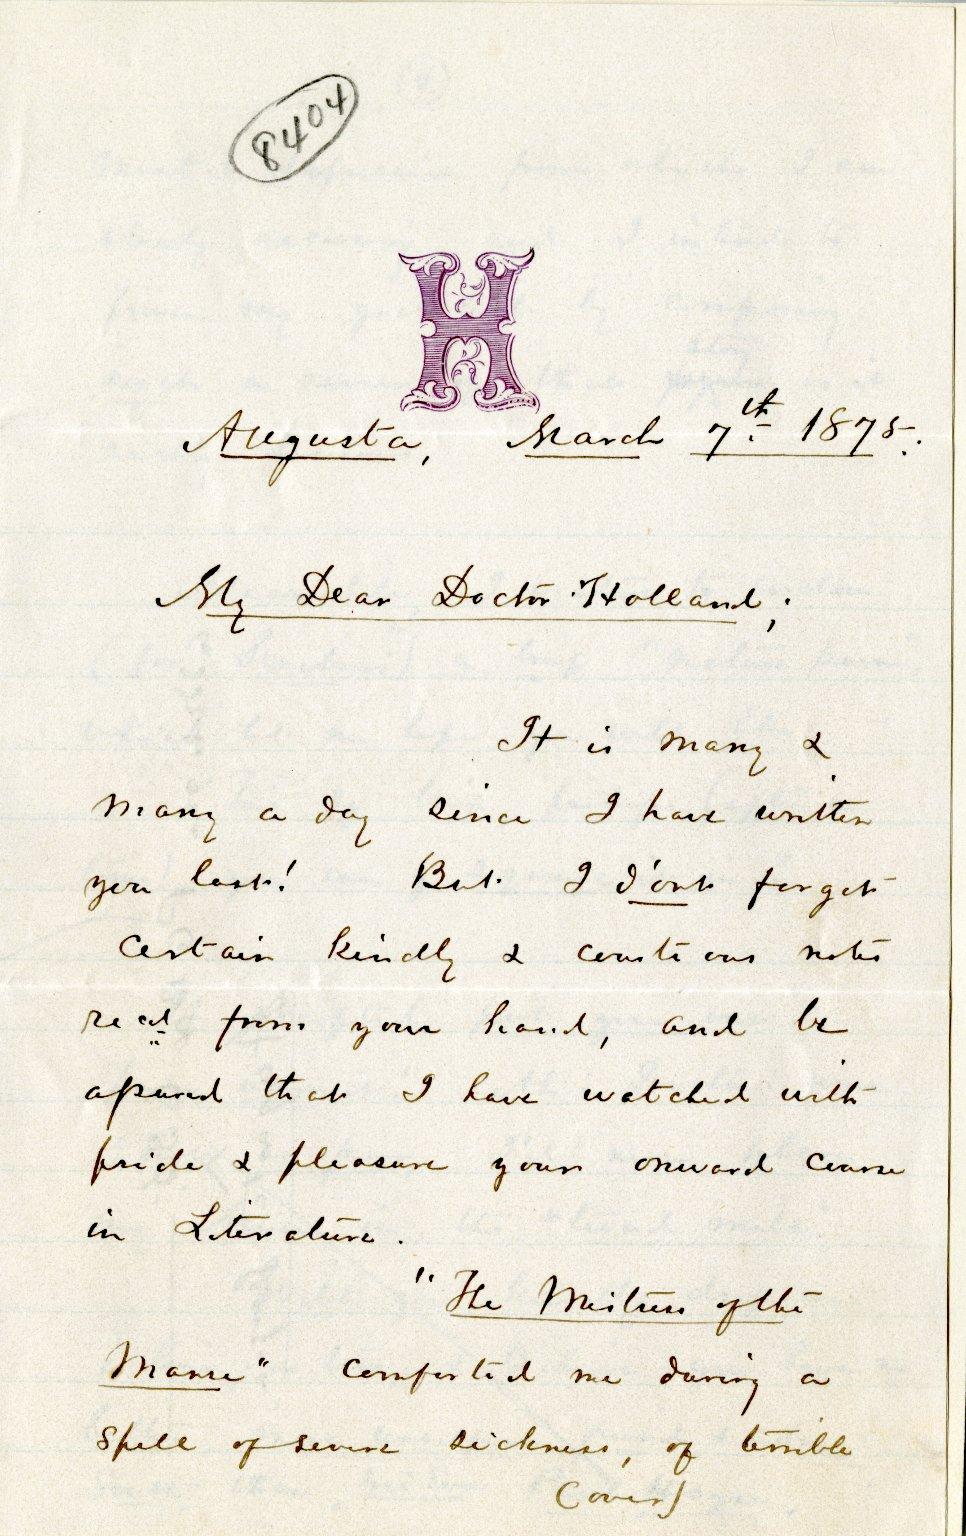 Hayne, Paul. ALS, 2 pages, March 7, 1875.